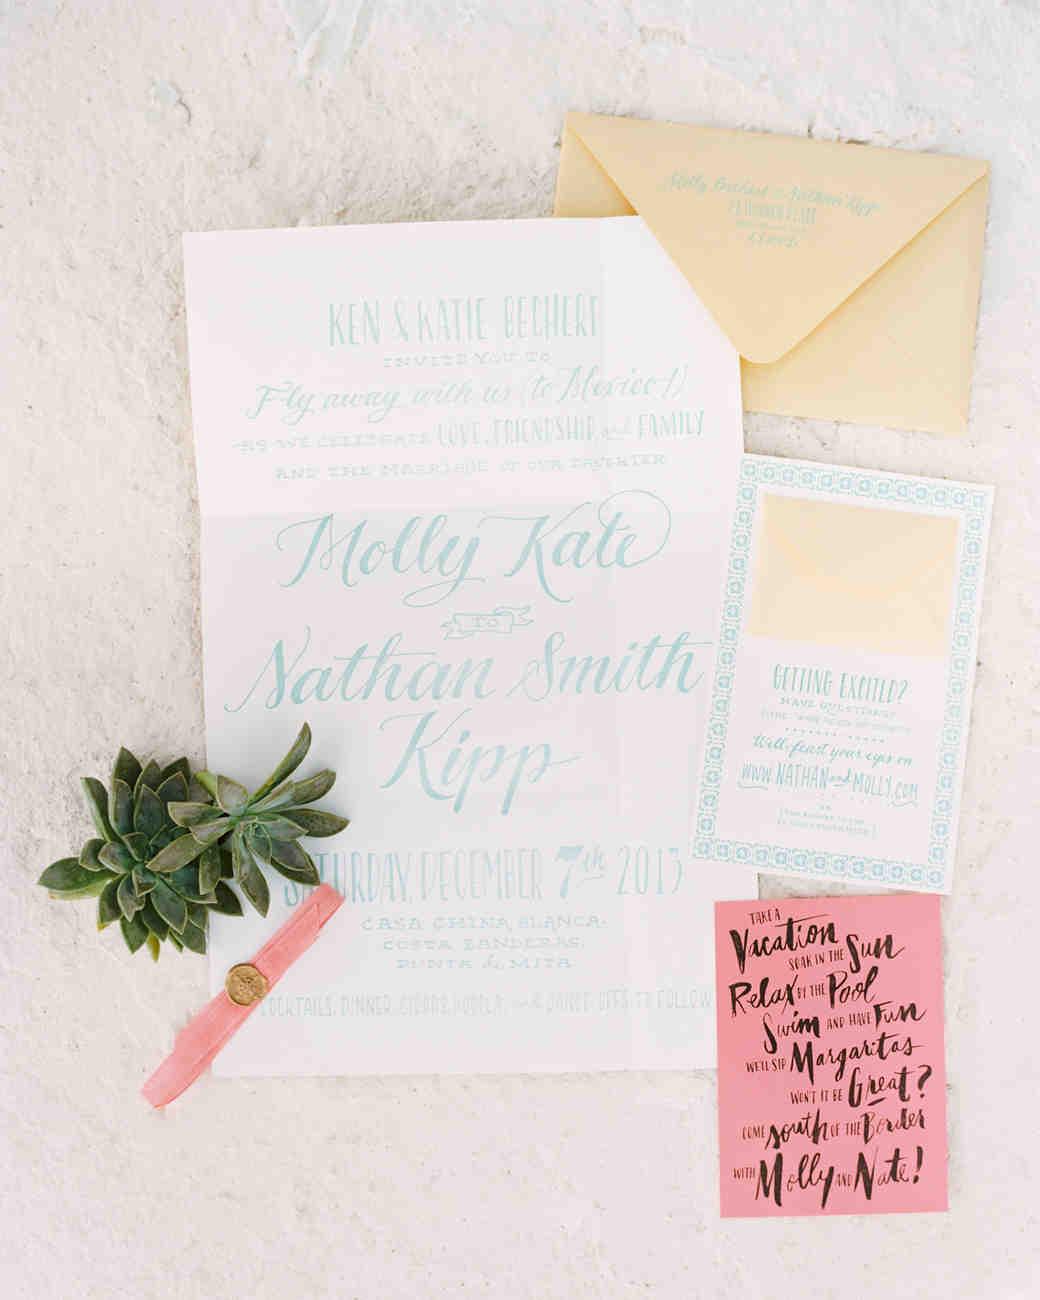 molly-nate-wedding-invite-007-s111479-0814.jpg